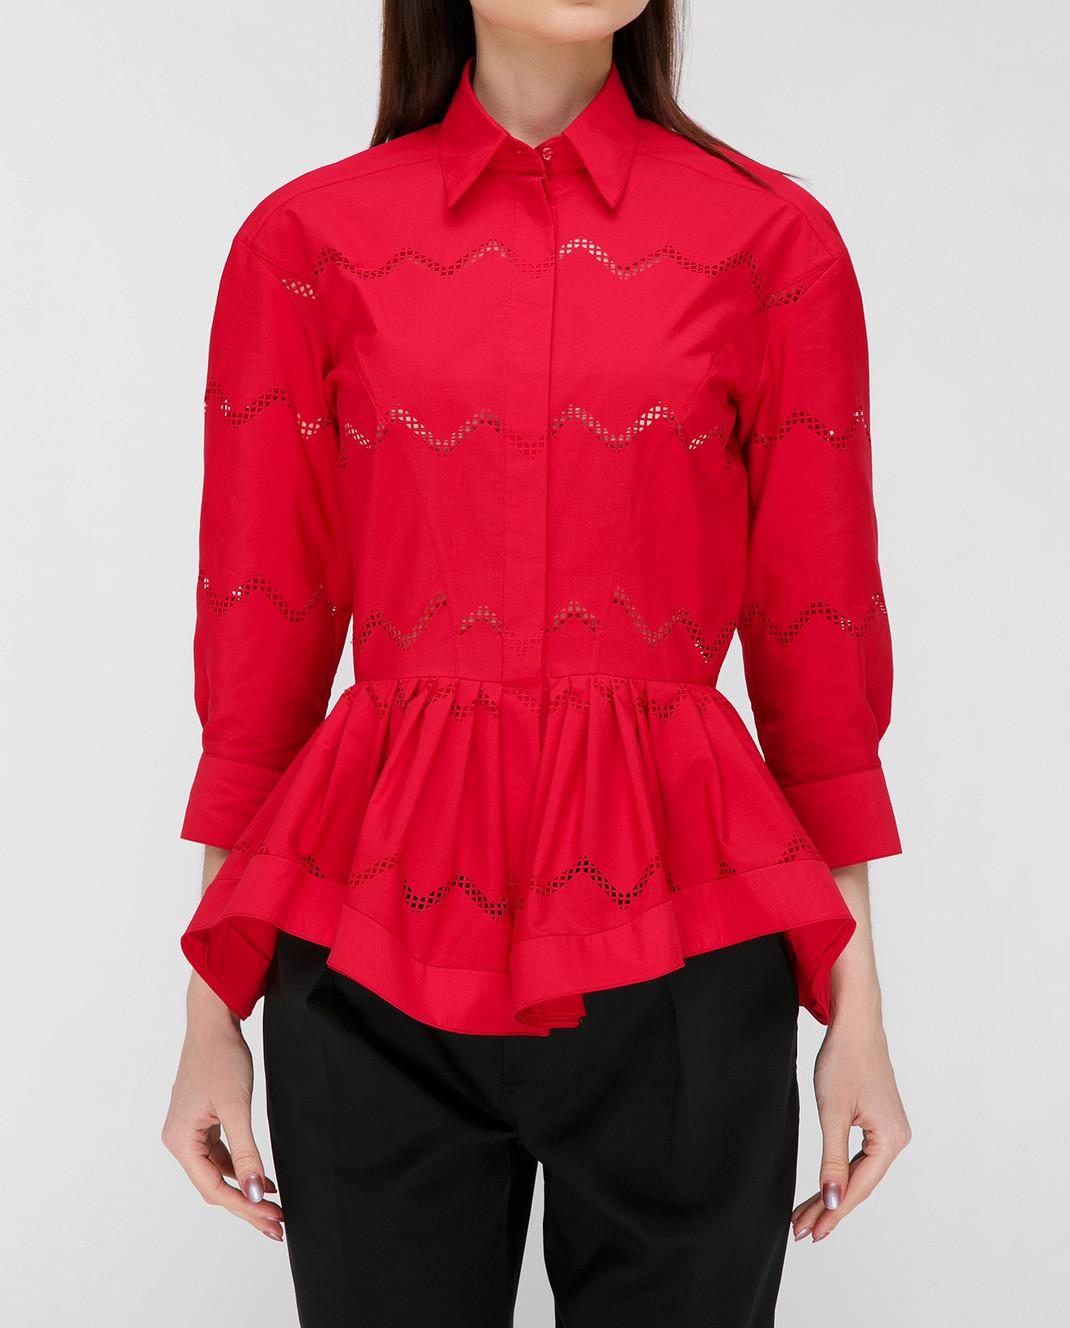 Azzedine Alaia Красная блуза 7S9C081RTL49 изображение 3